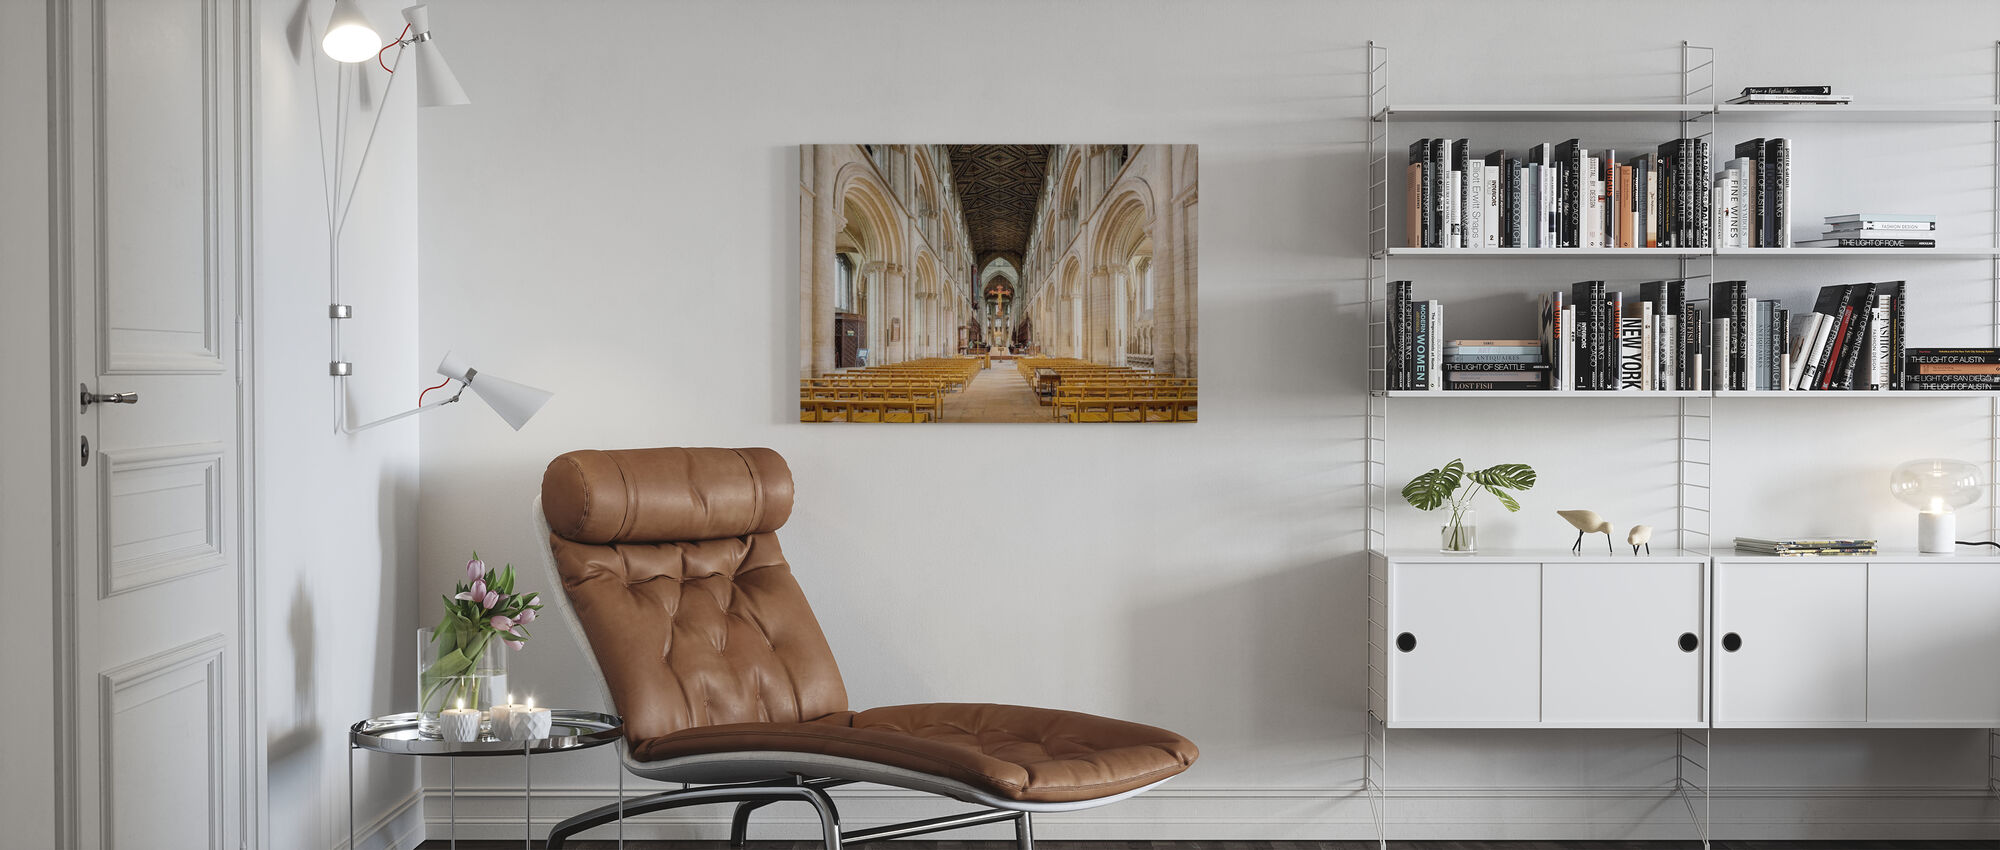 Katedralen kirke - Lerretsbilde - Stue